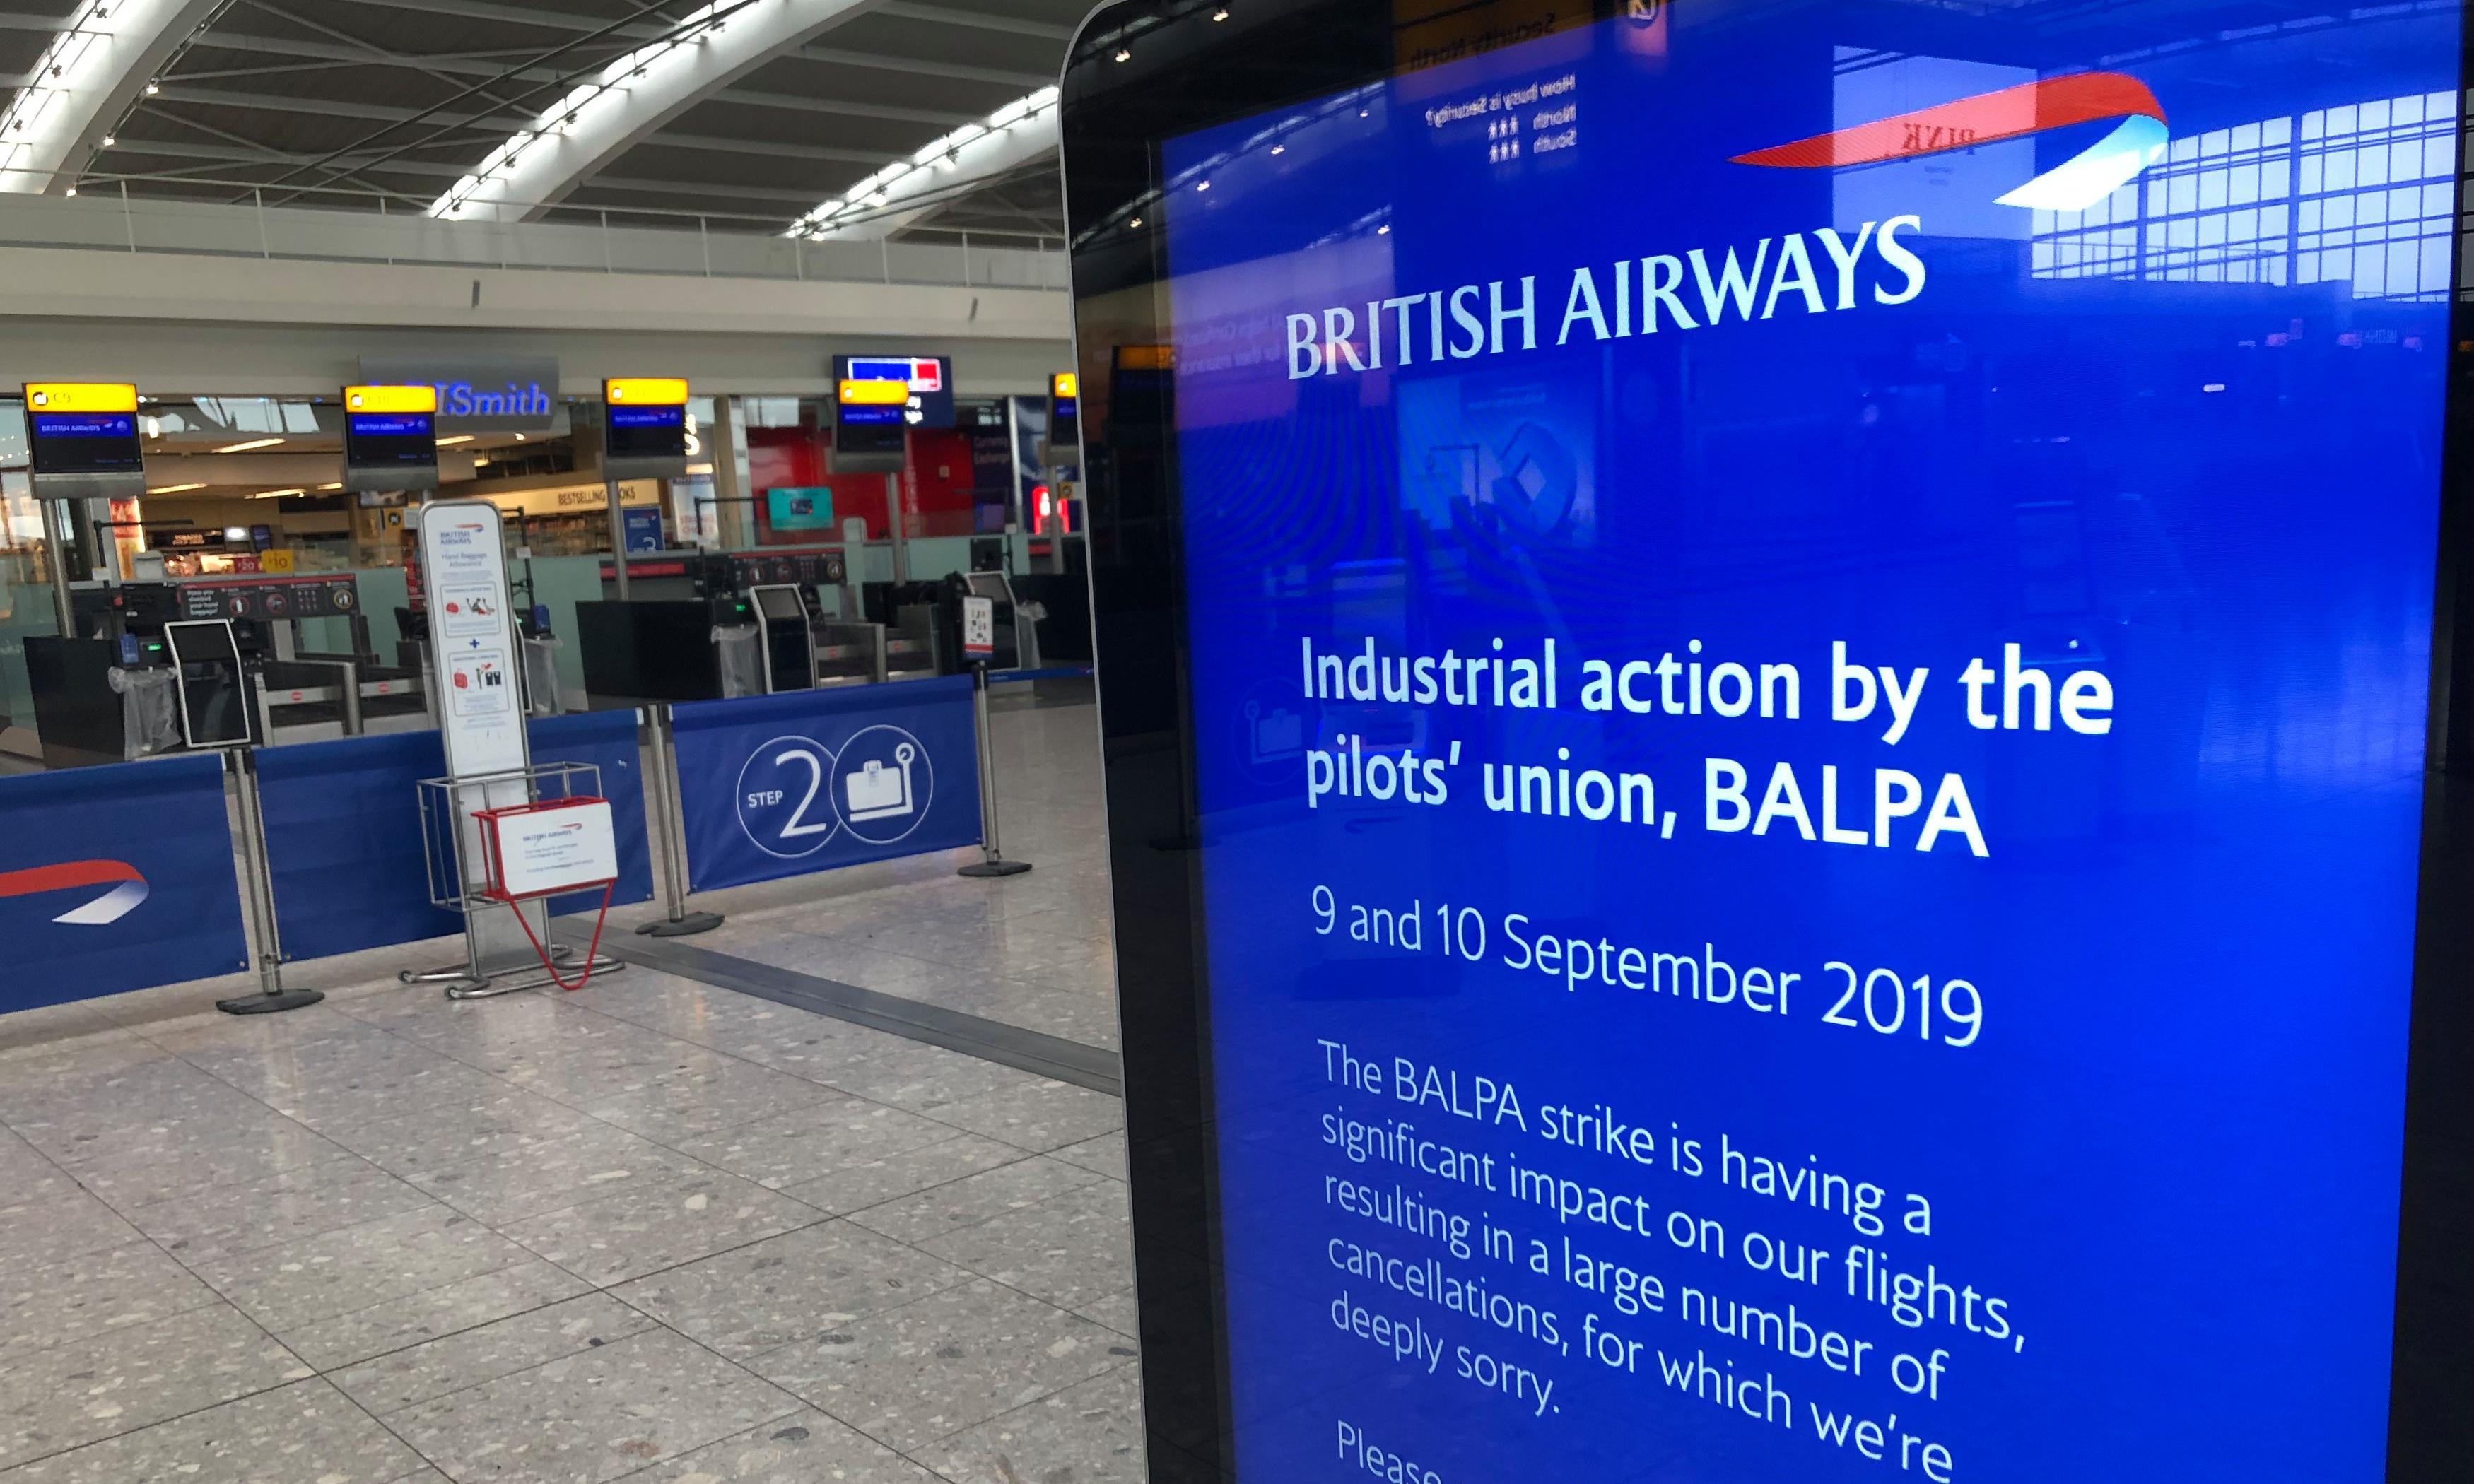 BA fails to keep its promise over pilots' strike fiasco